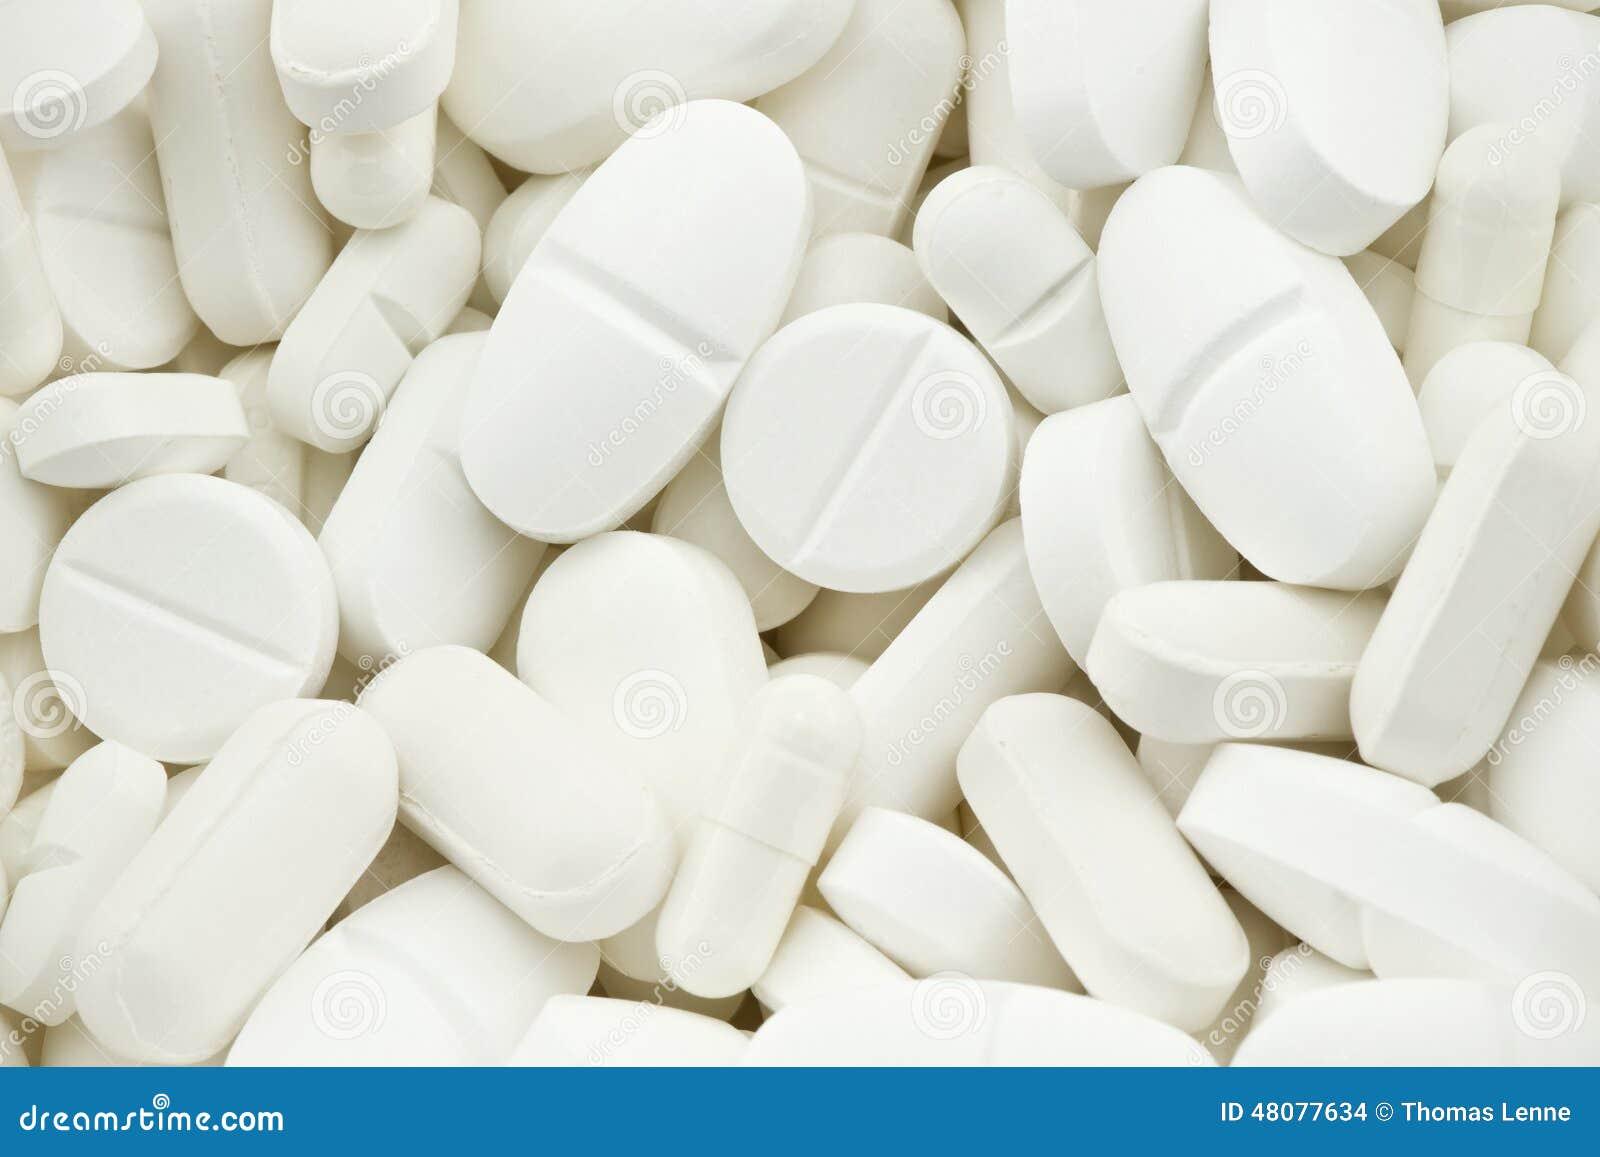 Drogas blancas